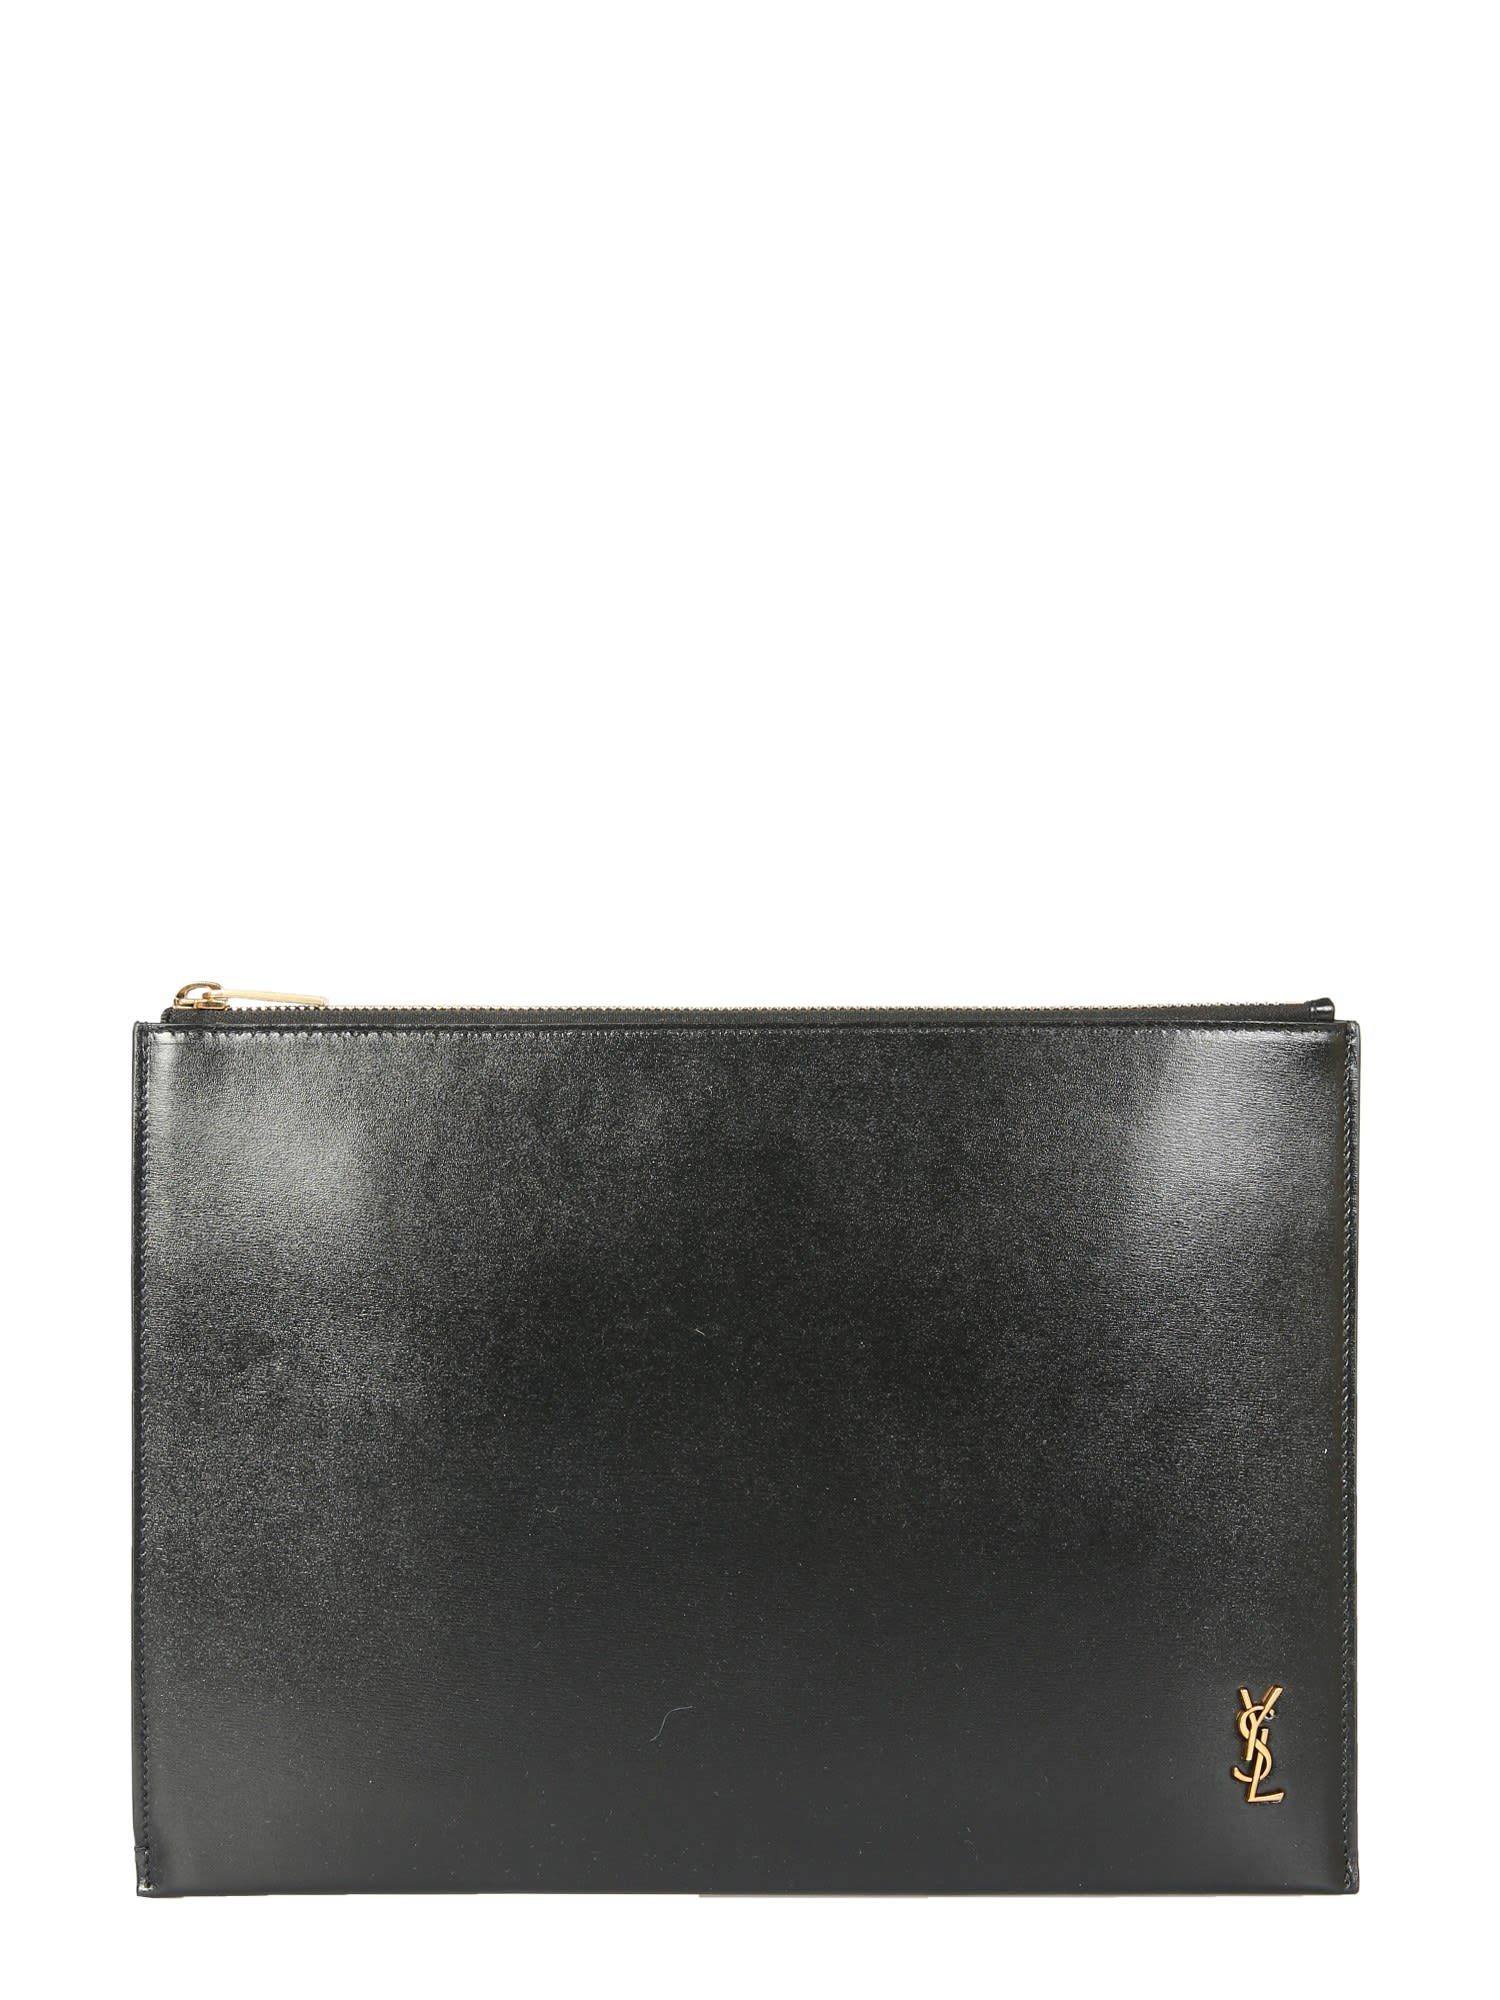 Saint Laurent Monogram Tablet Holder